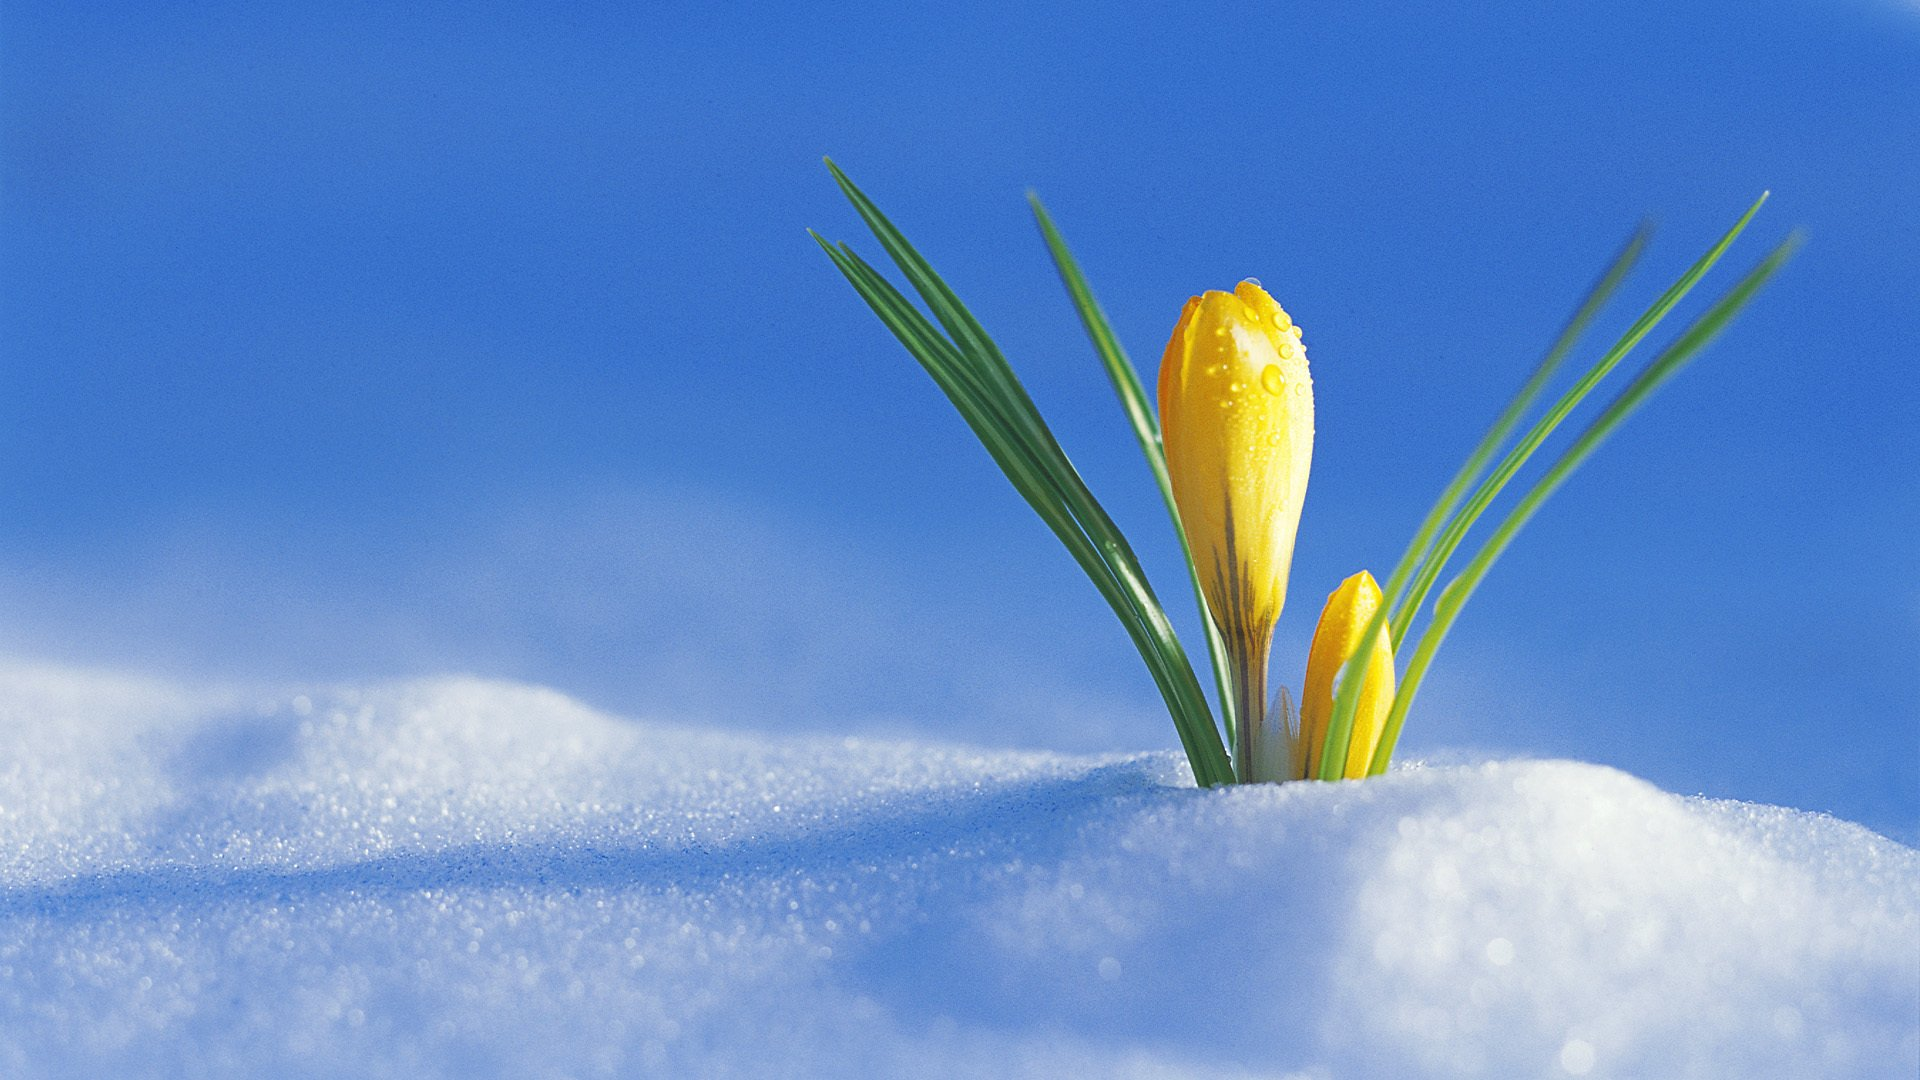 #весна  - Изображение 6